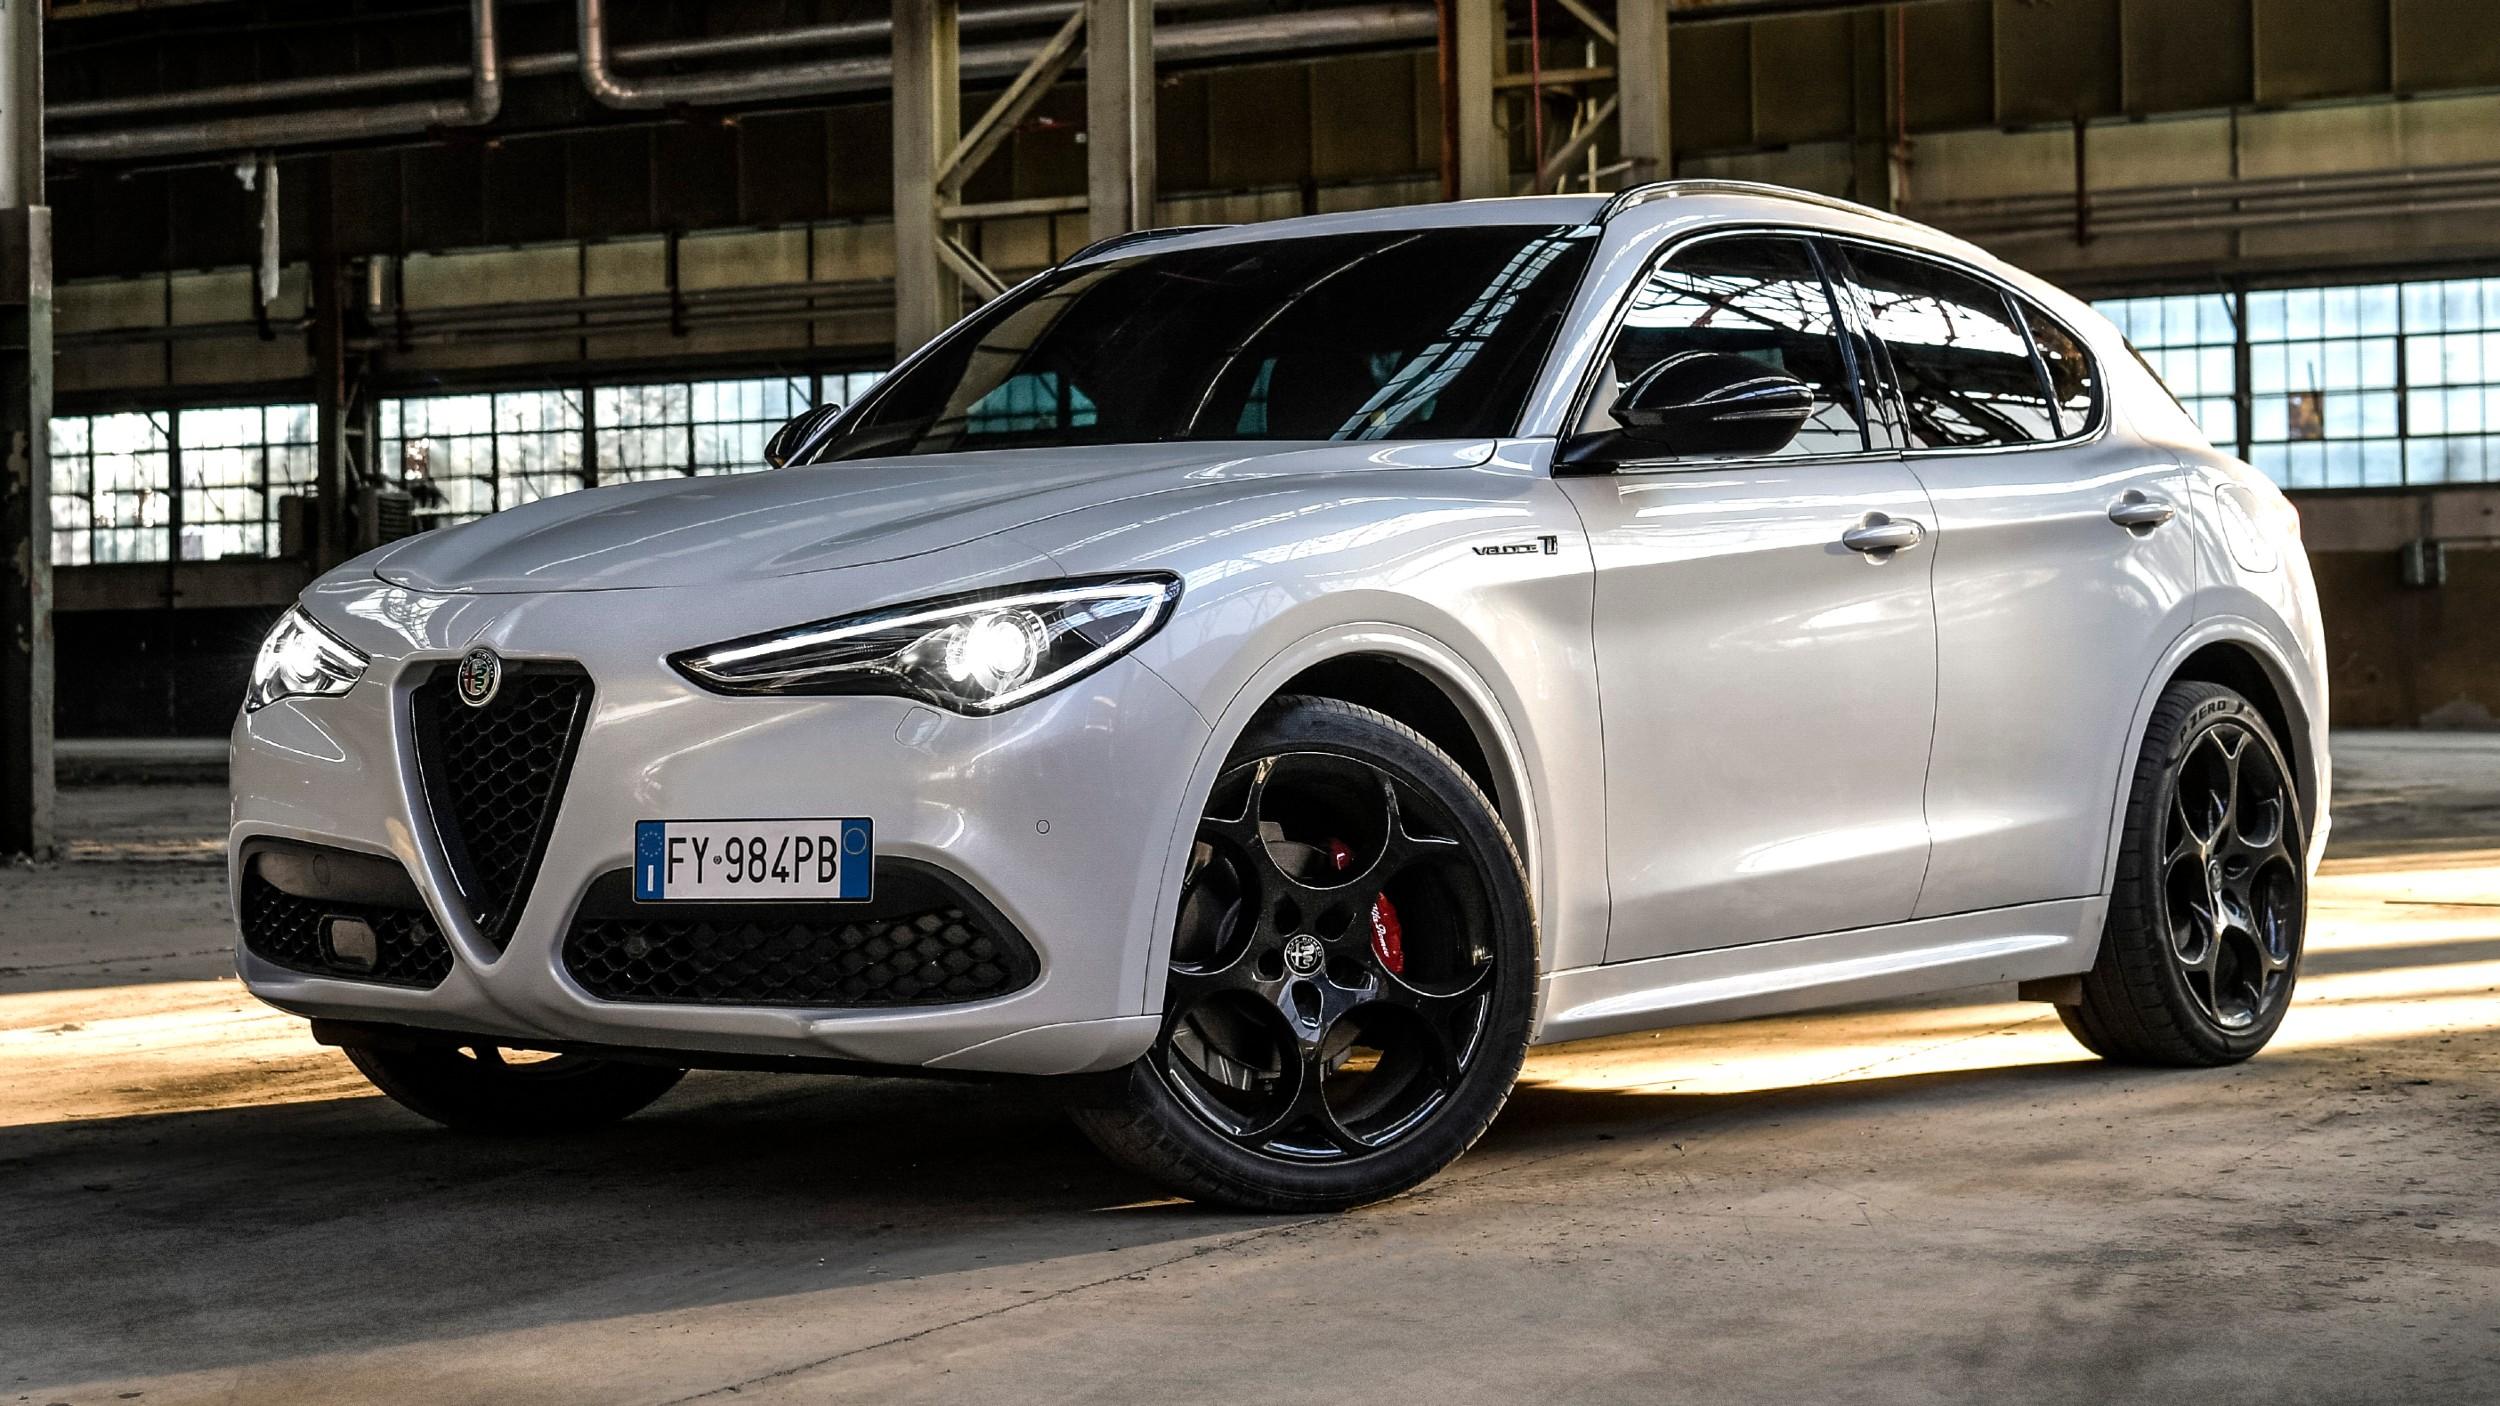 Alfa Romeo Stelvio: Χαμηλότερες τιμές για τη νέα γκάμα